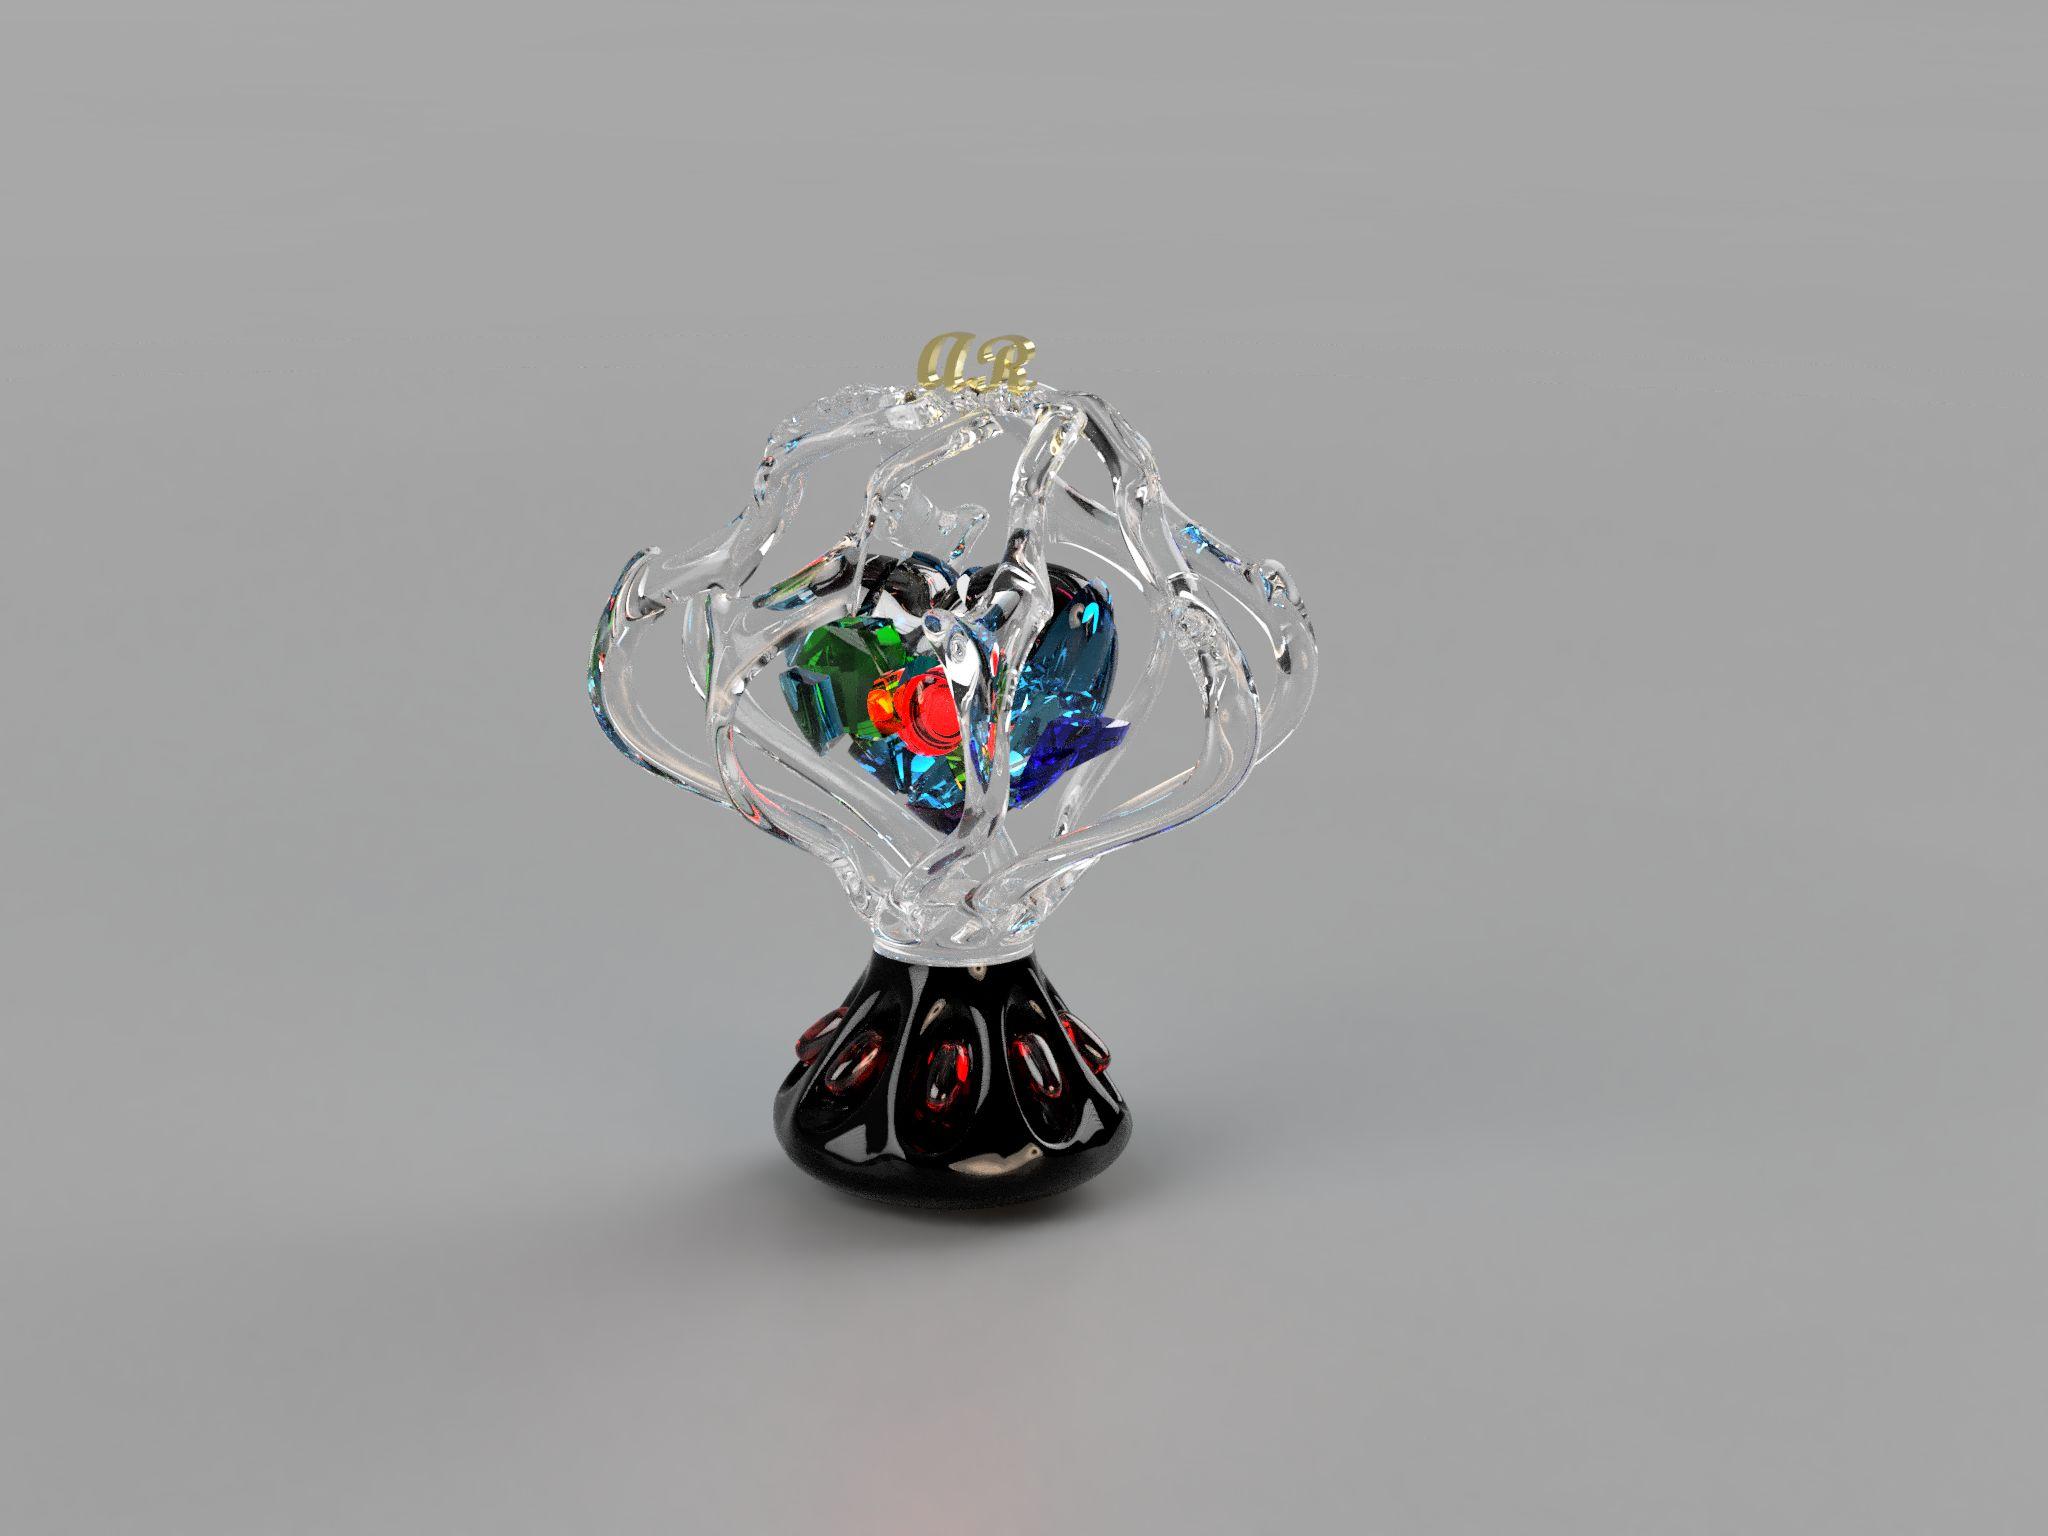 Kokoro-2018-dec-14-12-34-56am-000-customizedview27380223718-png-alpha-3500-3500